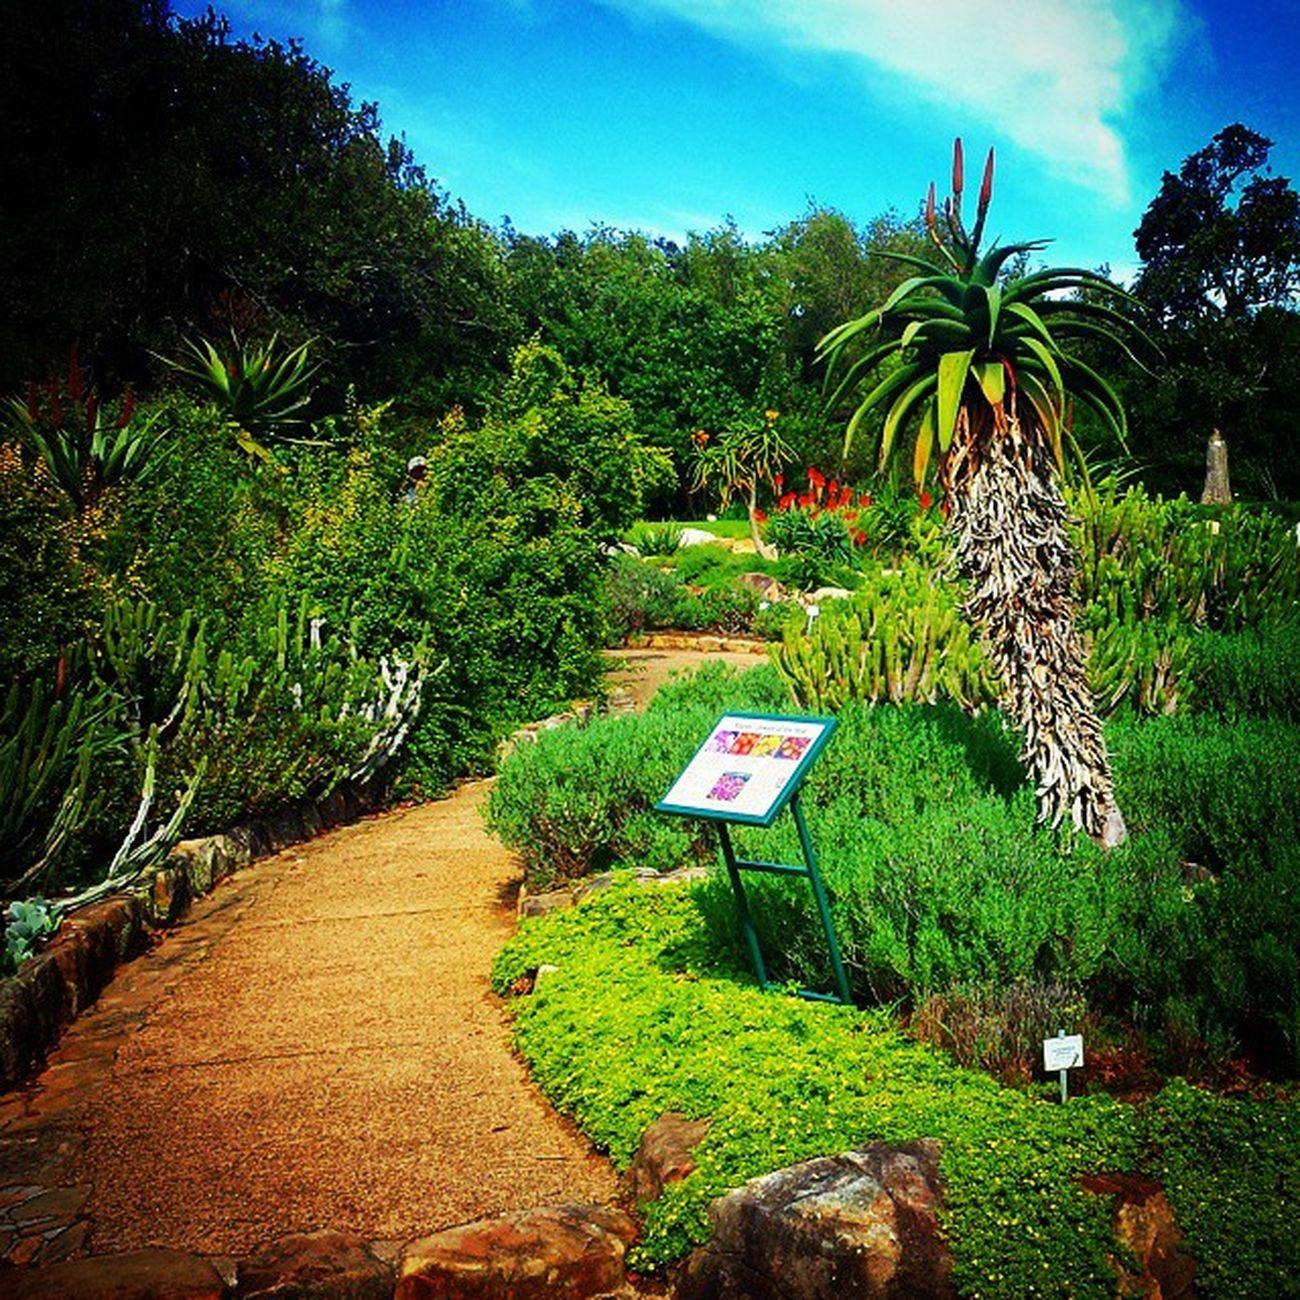 Botanicalgarden Botanicalgardens Southafrica Garden Gardening Urbangardening Tropical Tropicalgarden Garden Trees Tree Tropicalgardens Capetown Nature Flower